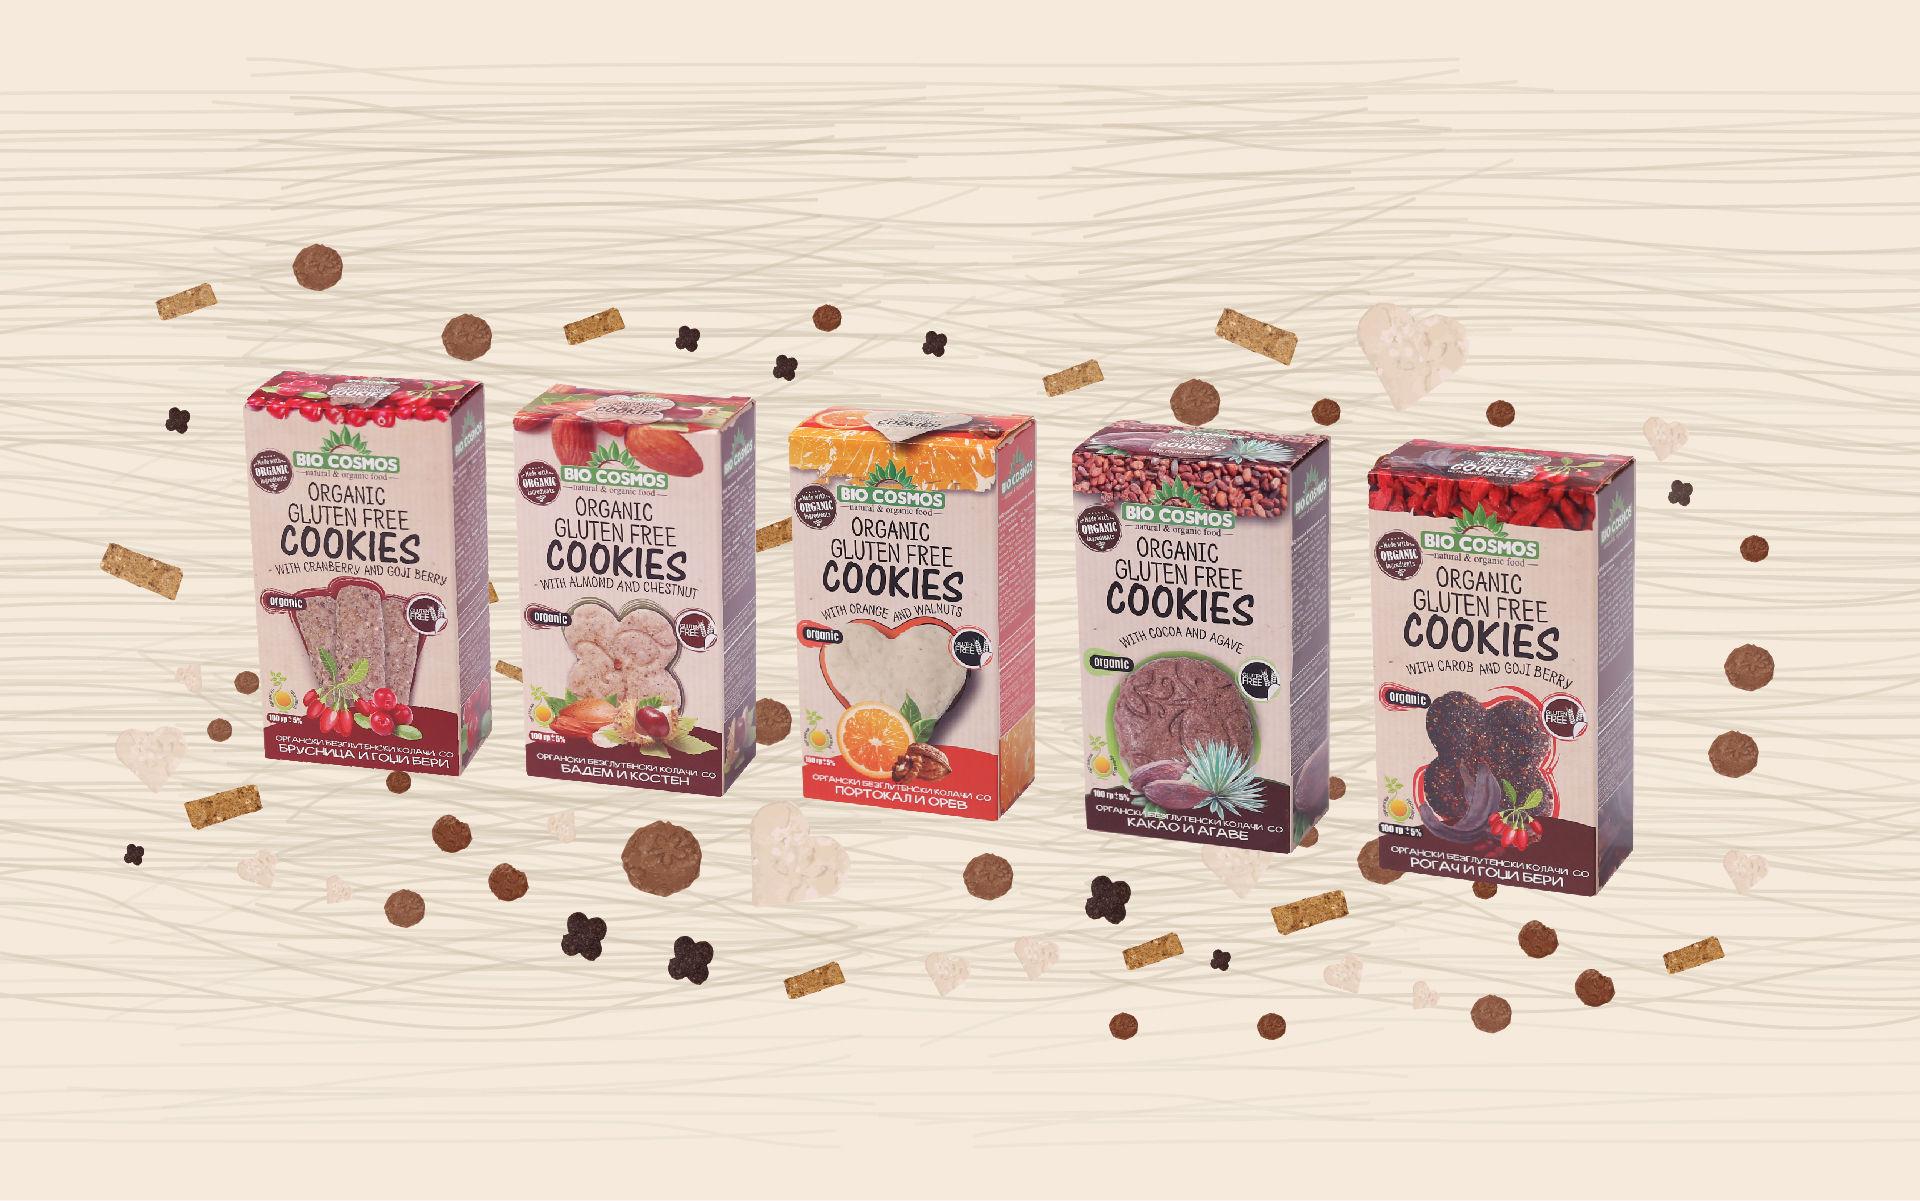 Organic Gluten-Free Cookies